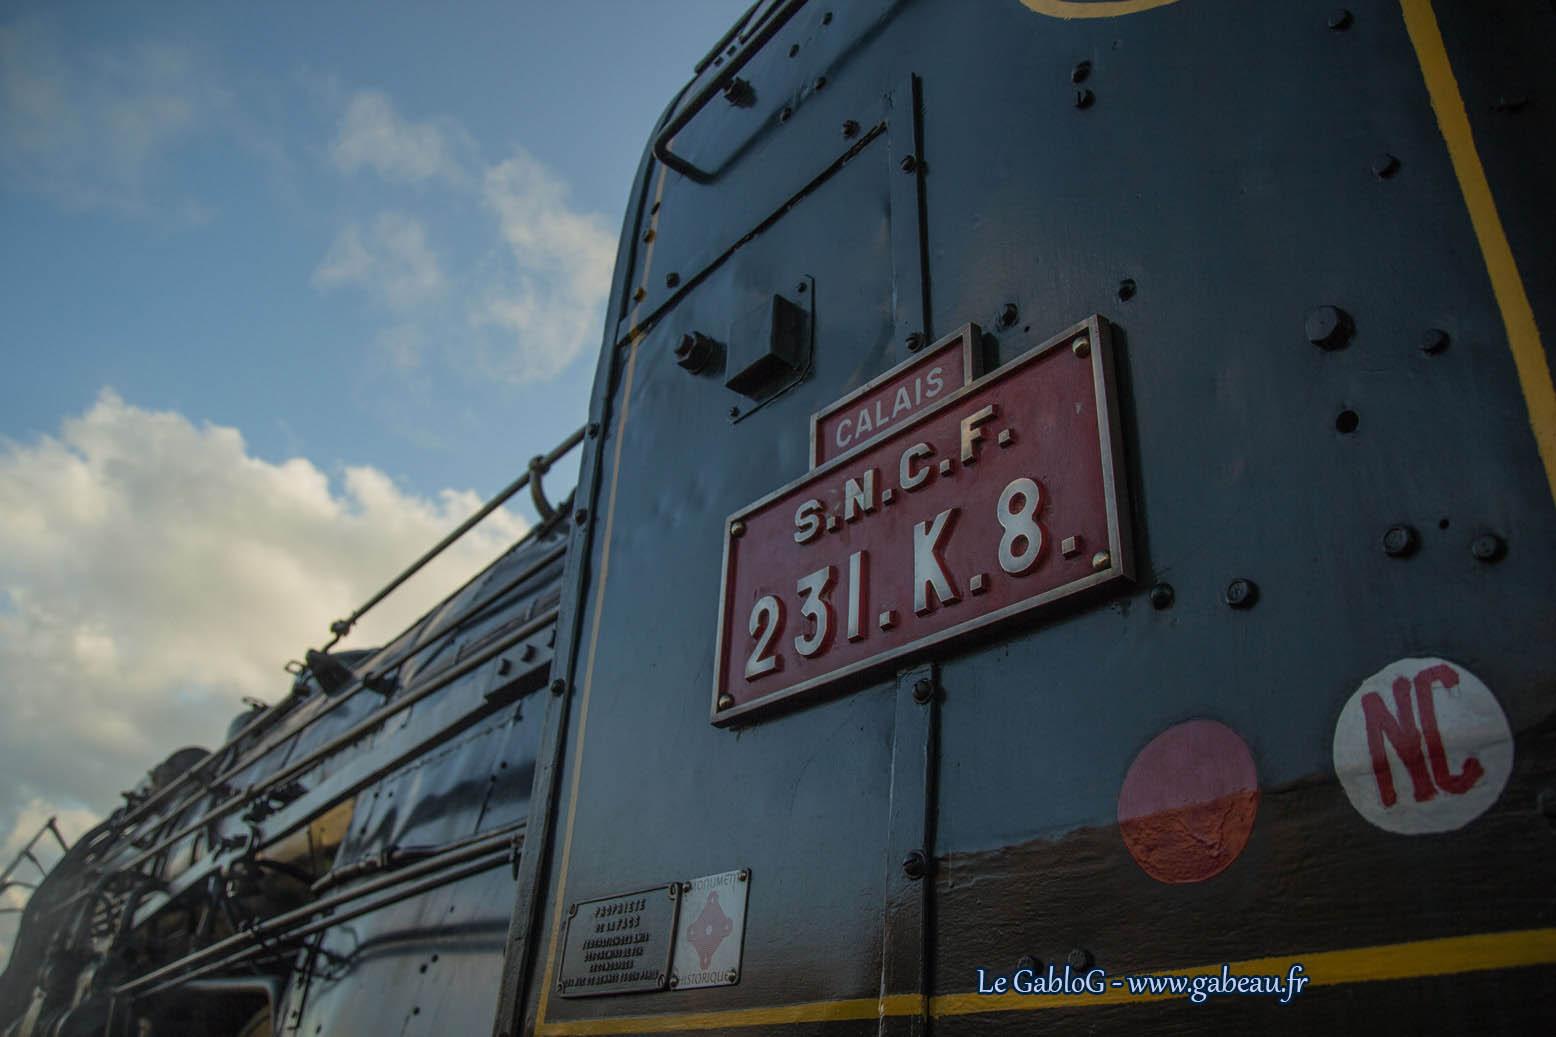 231 K8 Pacific